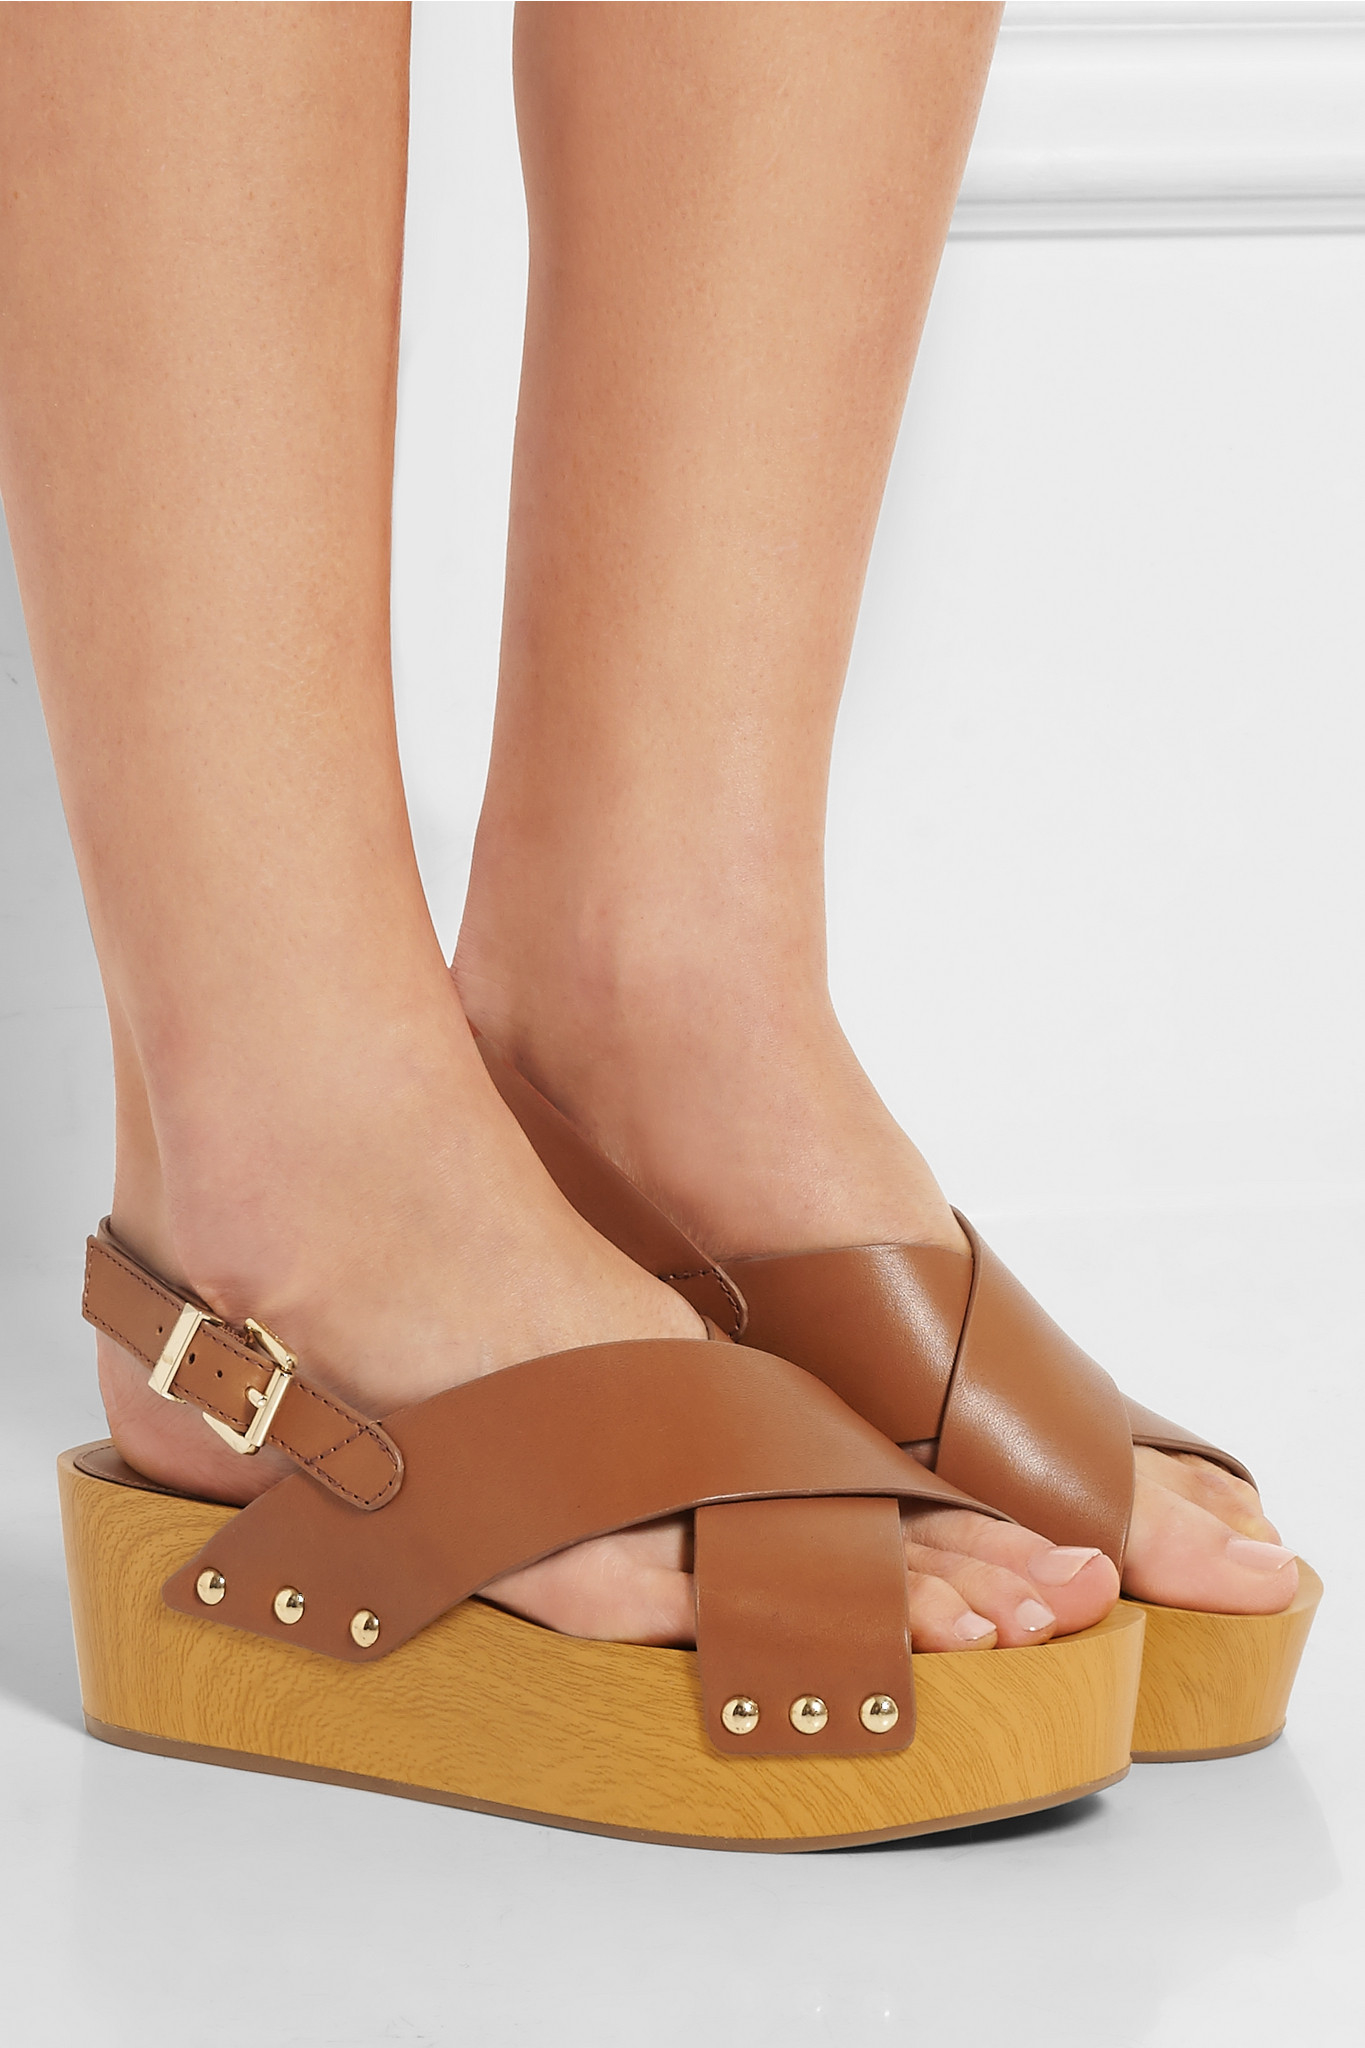 0b7fb3f0e60 Lyst - Sam Edelman Bentlee Leather Platform Sandals in Brown